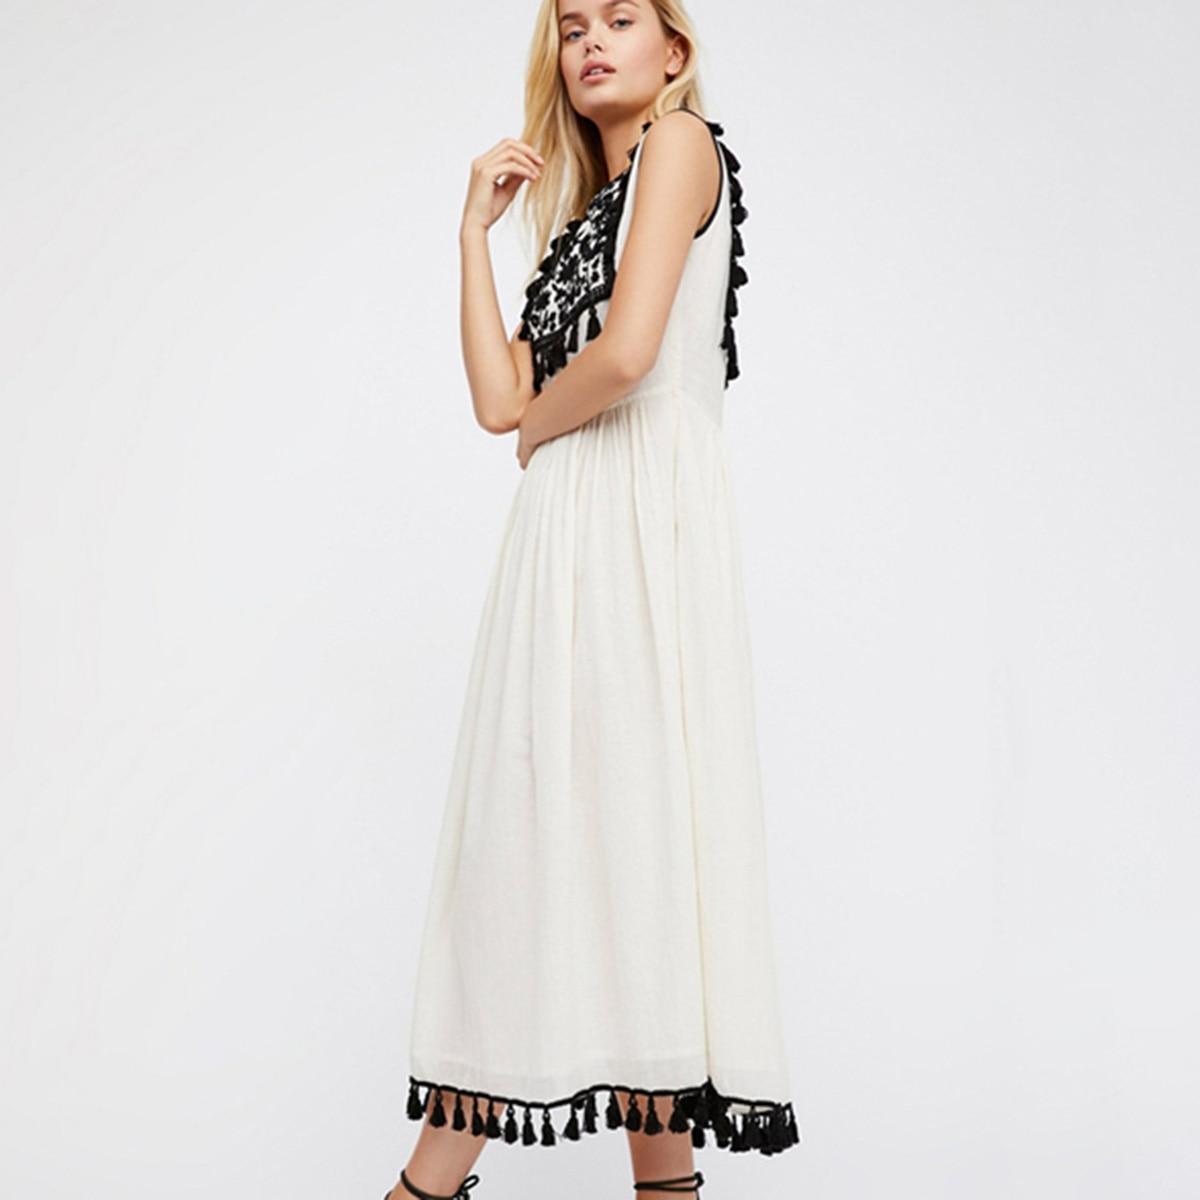 Boho Floral broderie Midi robe femmes été garniture de gland Vintage blanc lâche robes plage Boho Boho Hippie Chic robe 2019